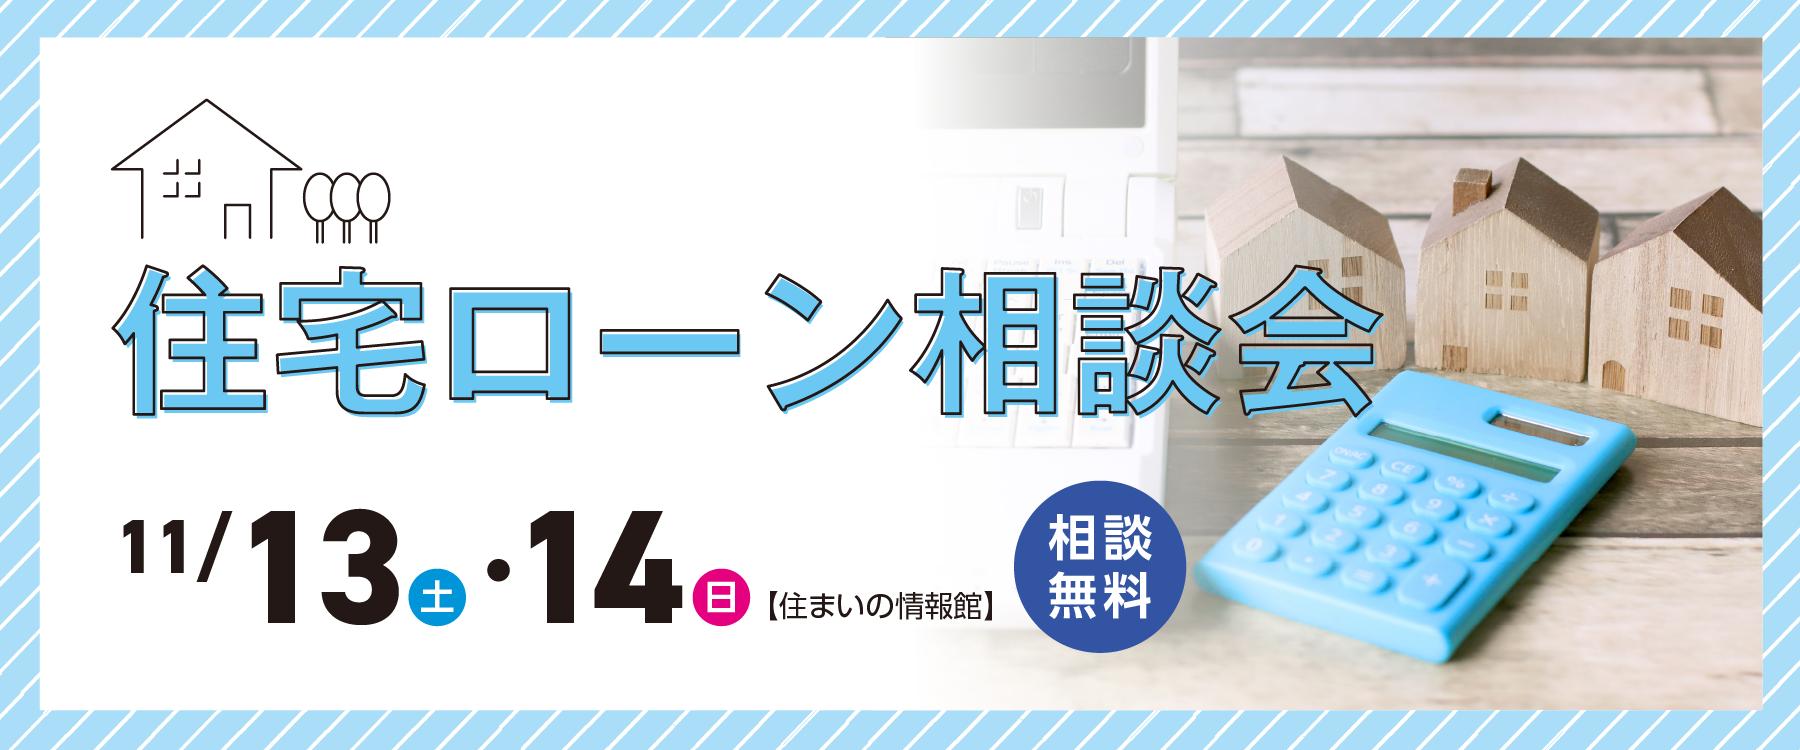 画像:11月13日(土)、14日(日)住宅ローン相談会